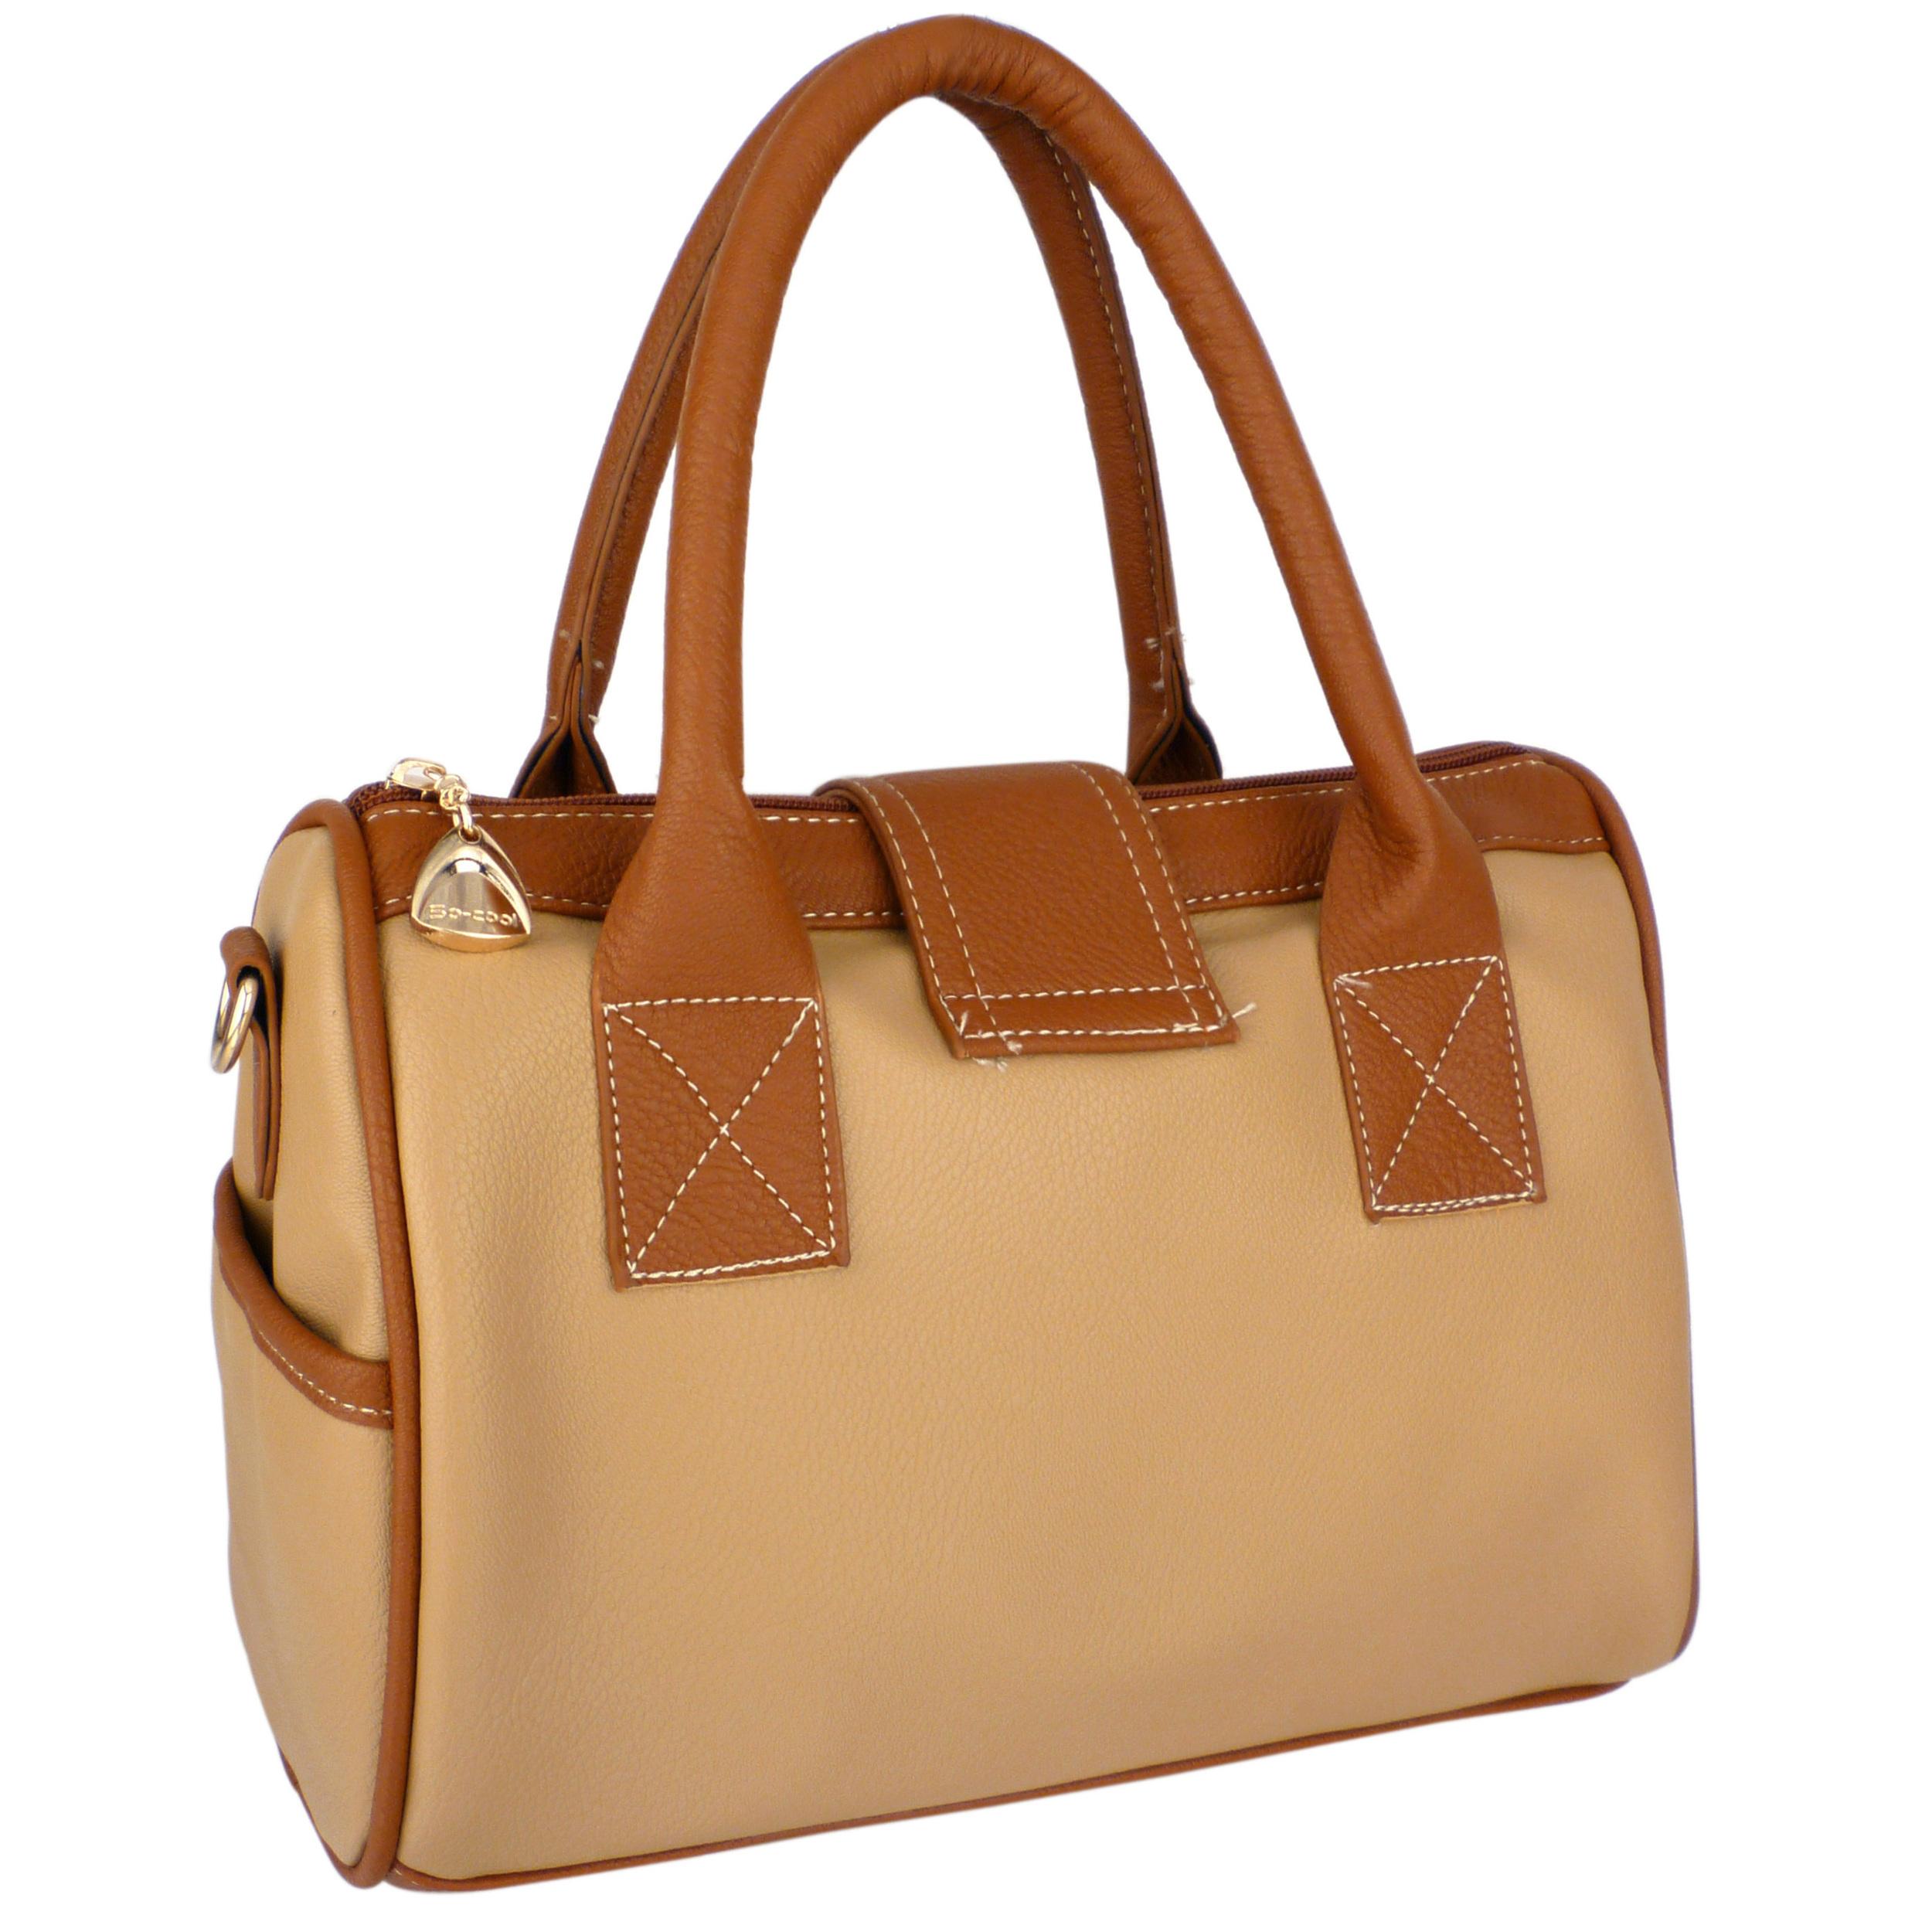 BRADLEY Brown Dual-tone Bowler Style Handbag back